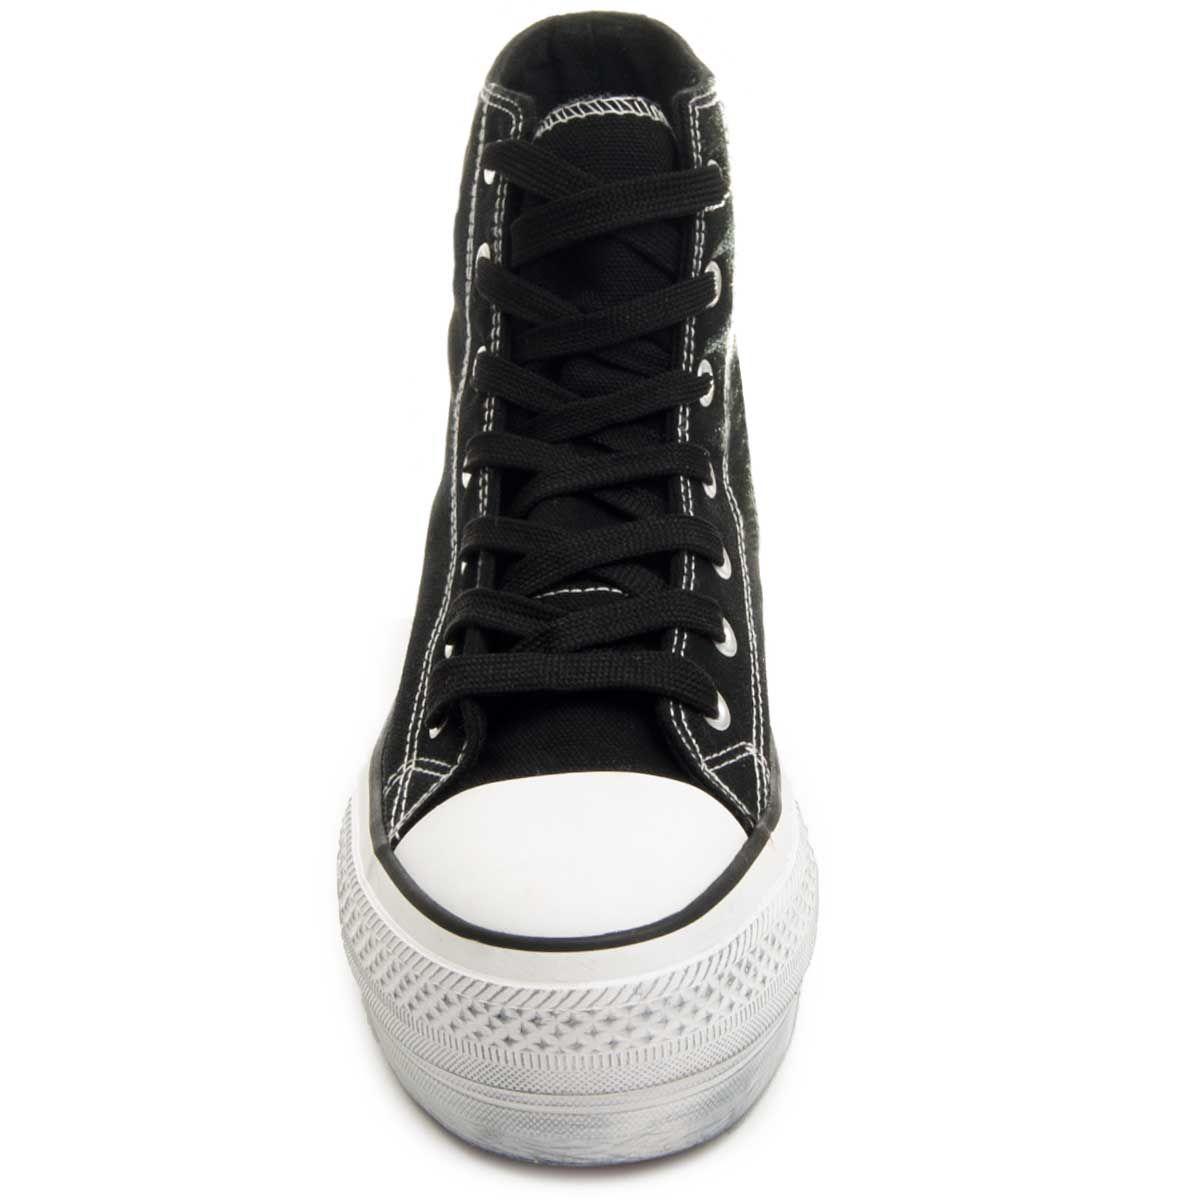 Montevita Flatform High-Top Sneaker in Black